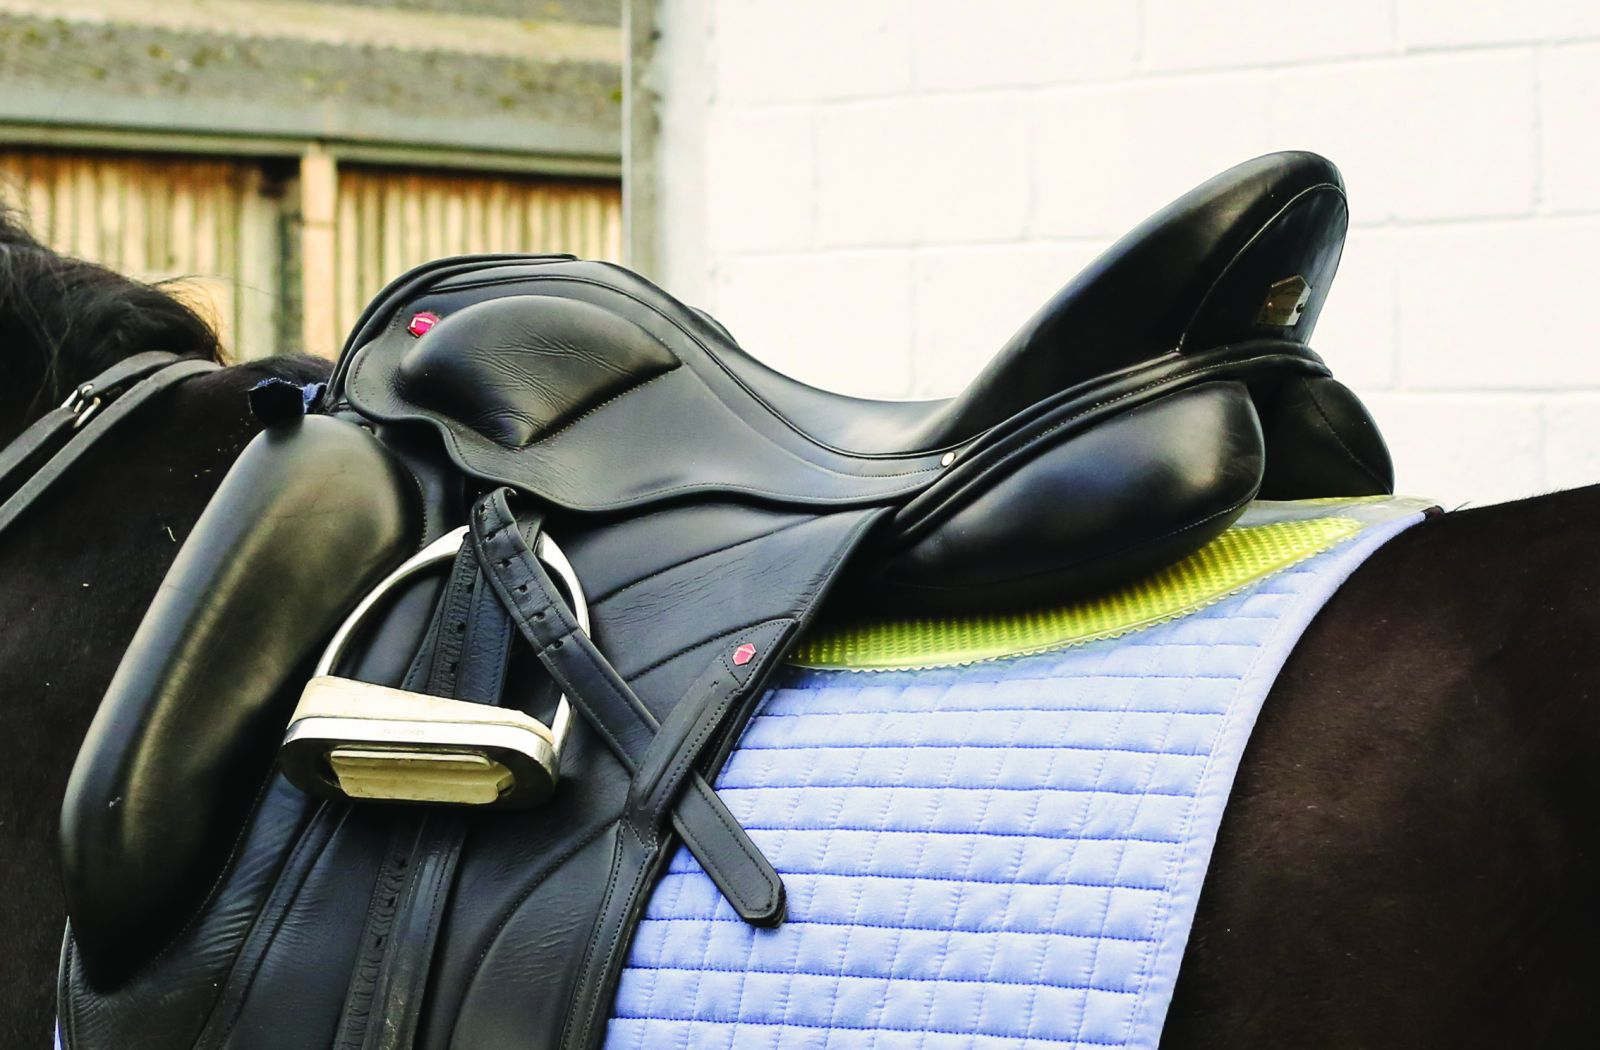 Meet Ultra-Thin VIP Equestrian Saddle Pad